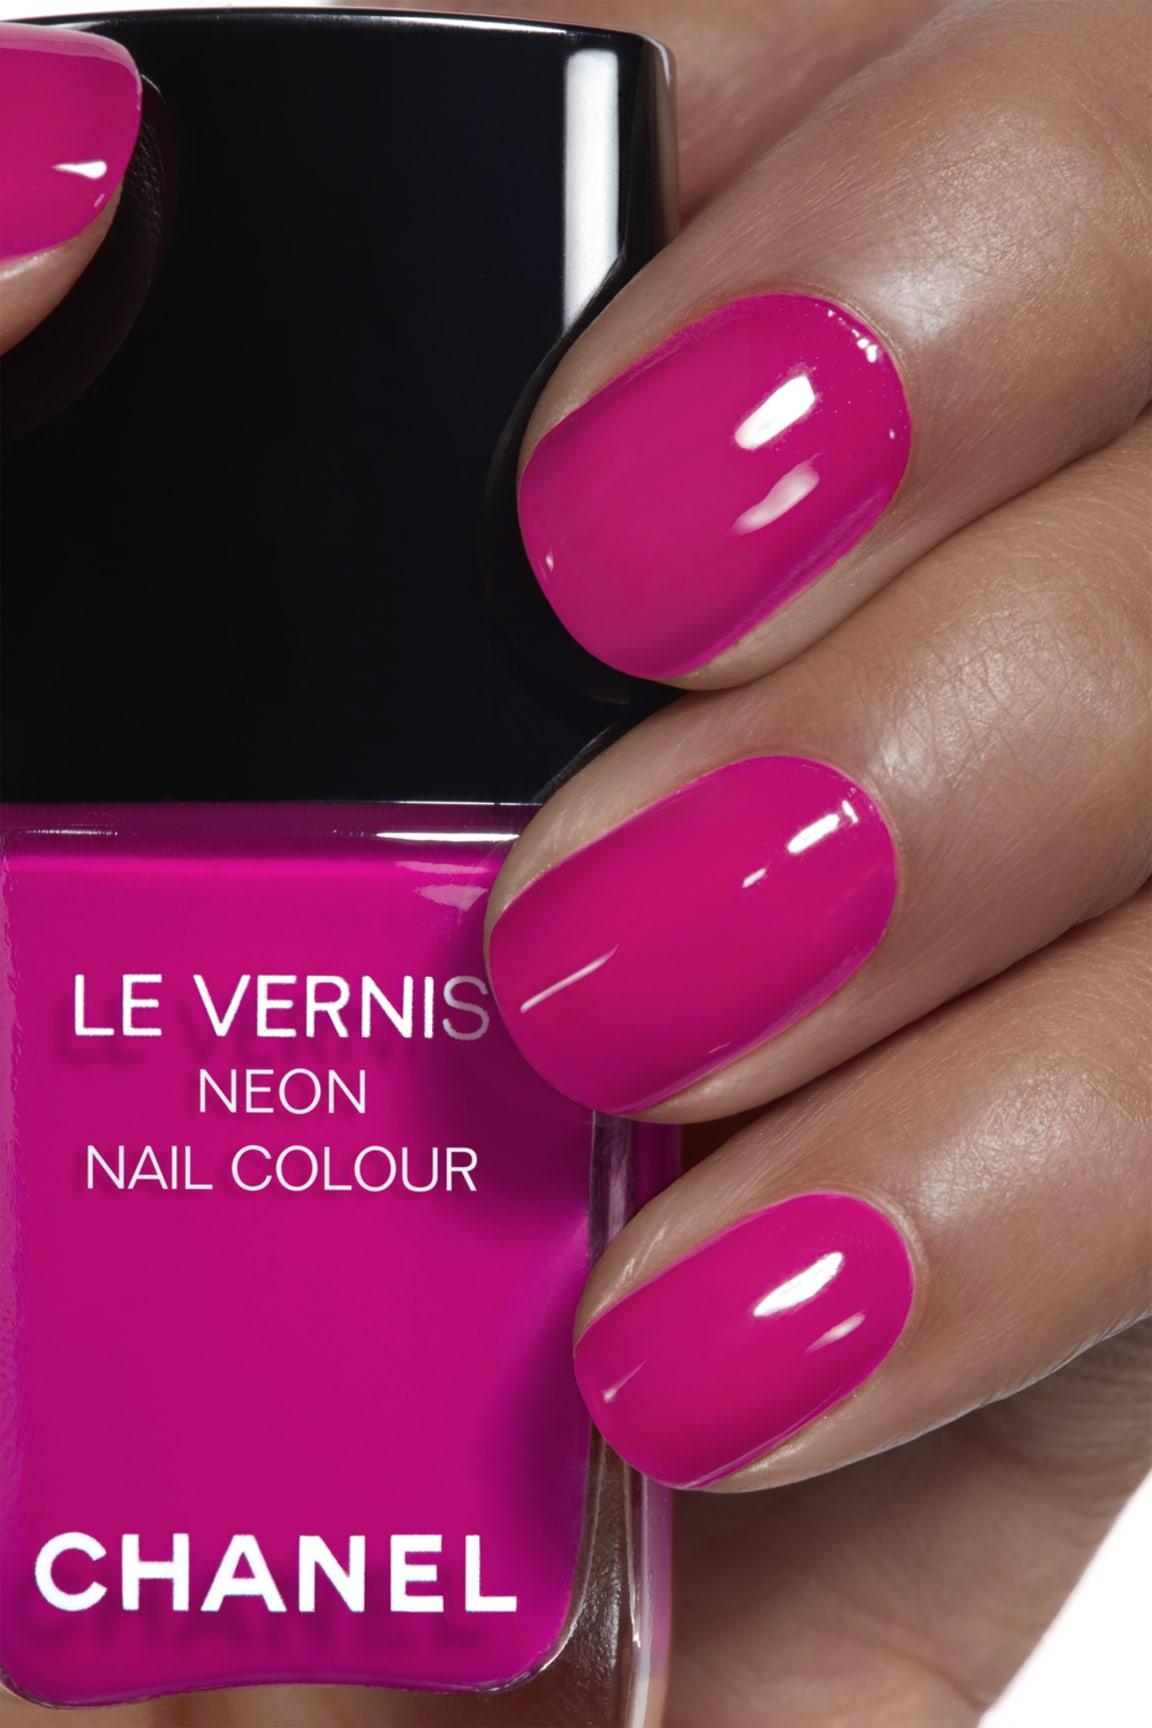 Application makeup visual 1 - LE VERNIS NEON NAIL COLOUR 648 - TECHNO BLOOM